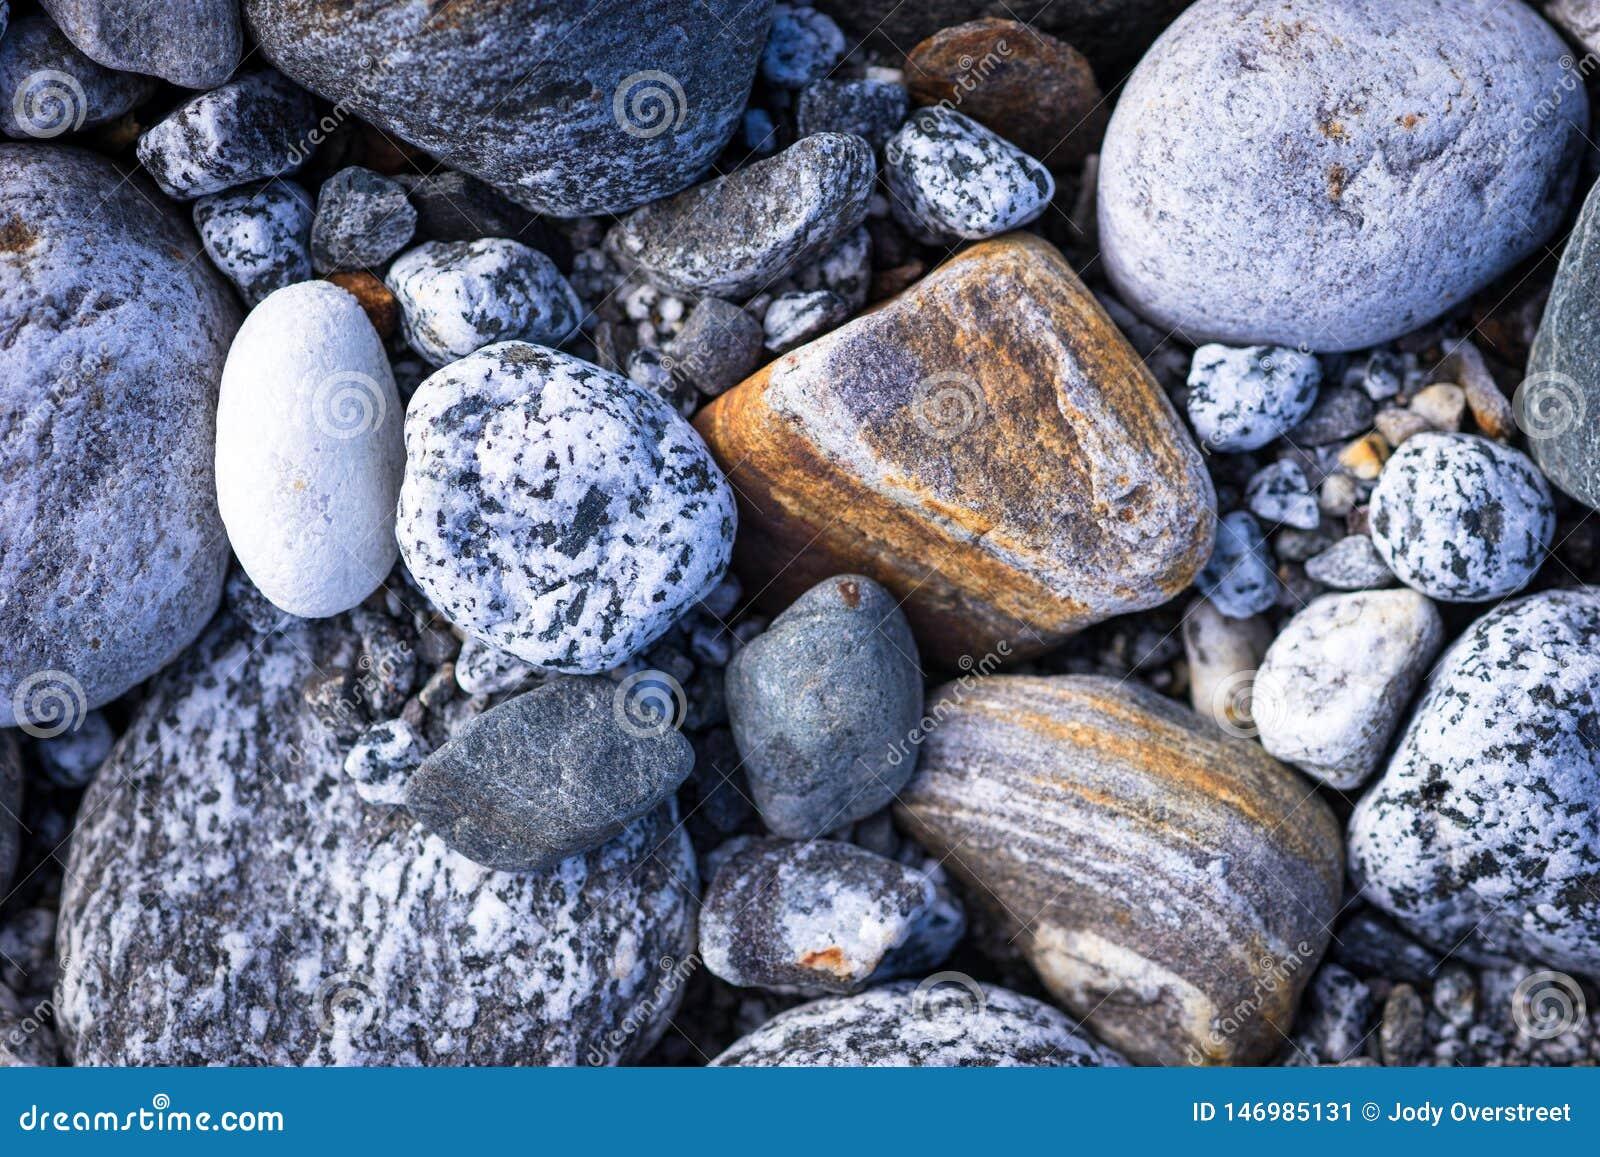 Detail of Assorted Beach Rocks